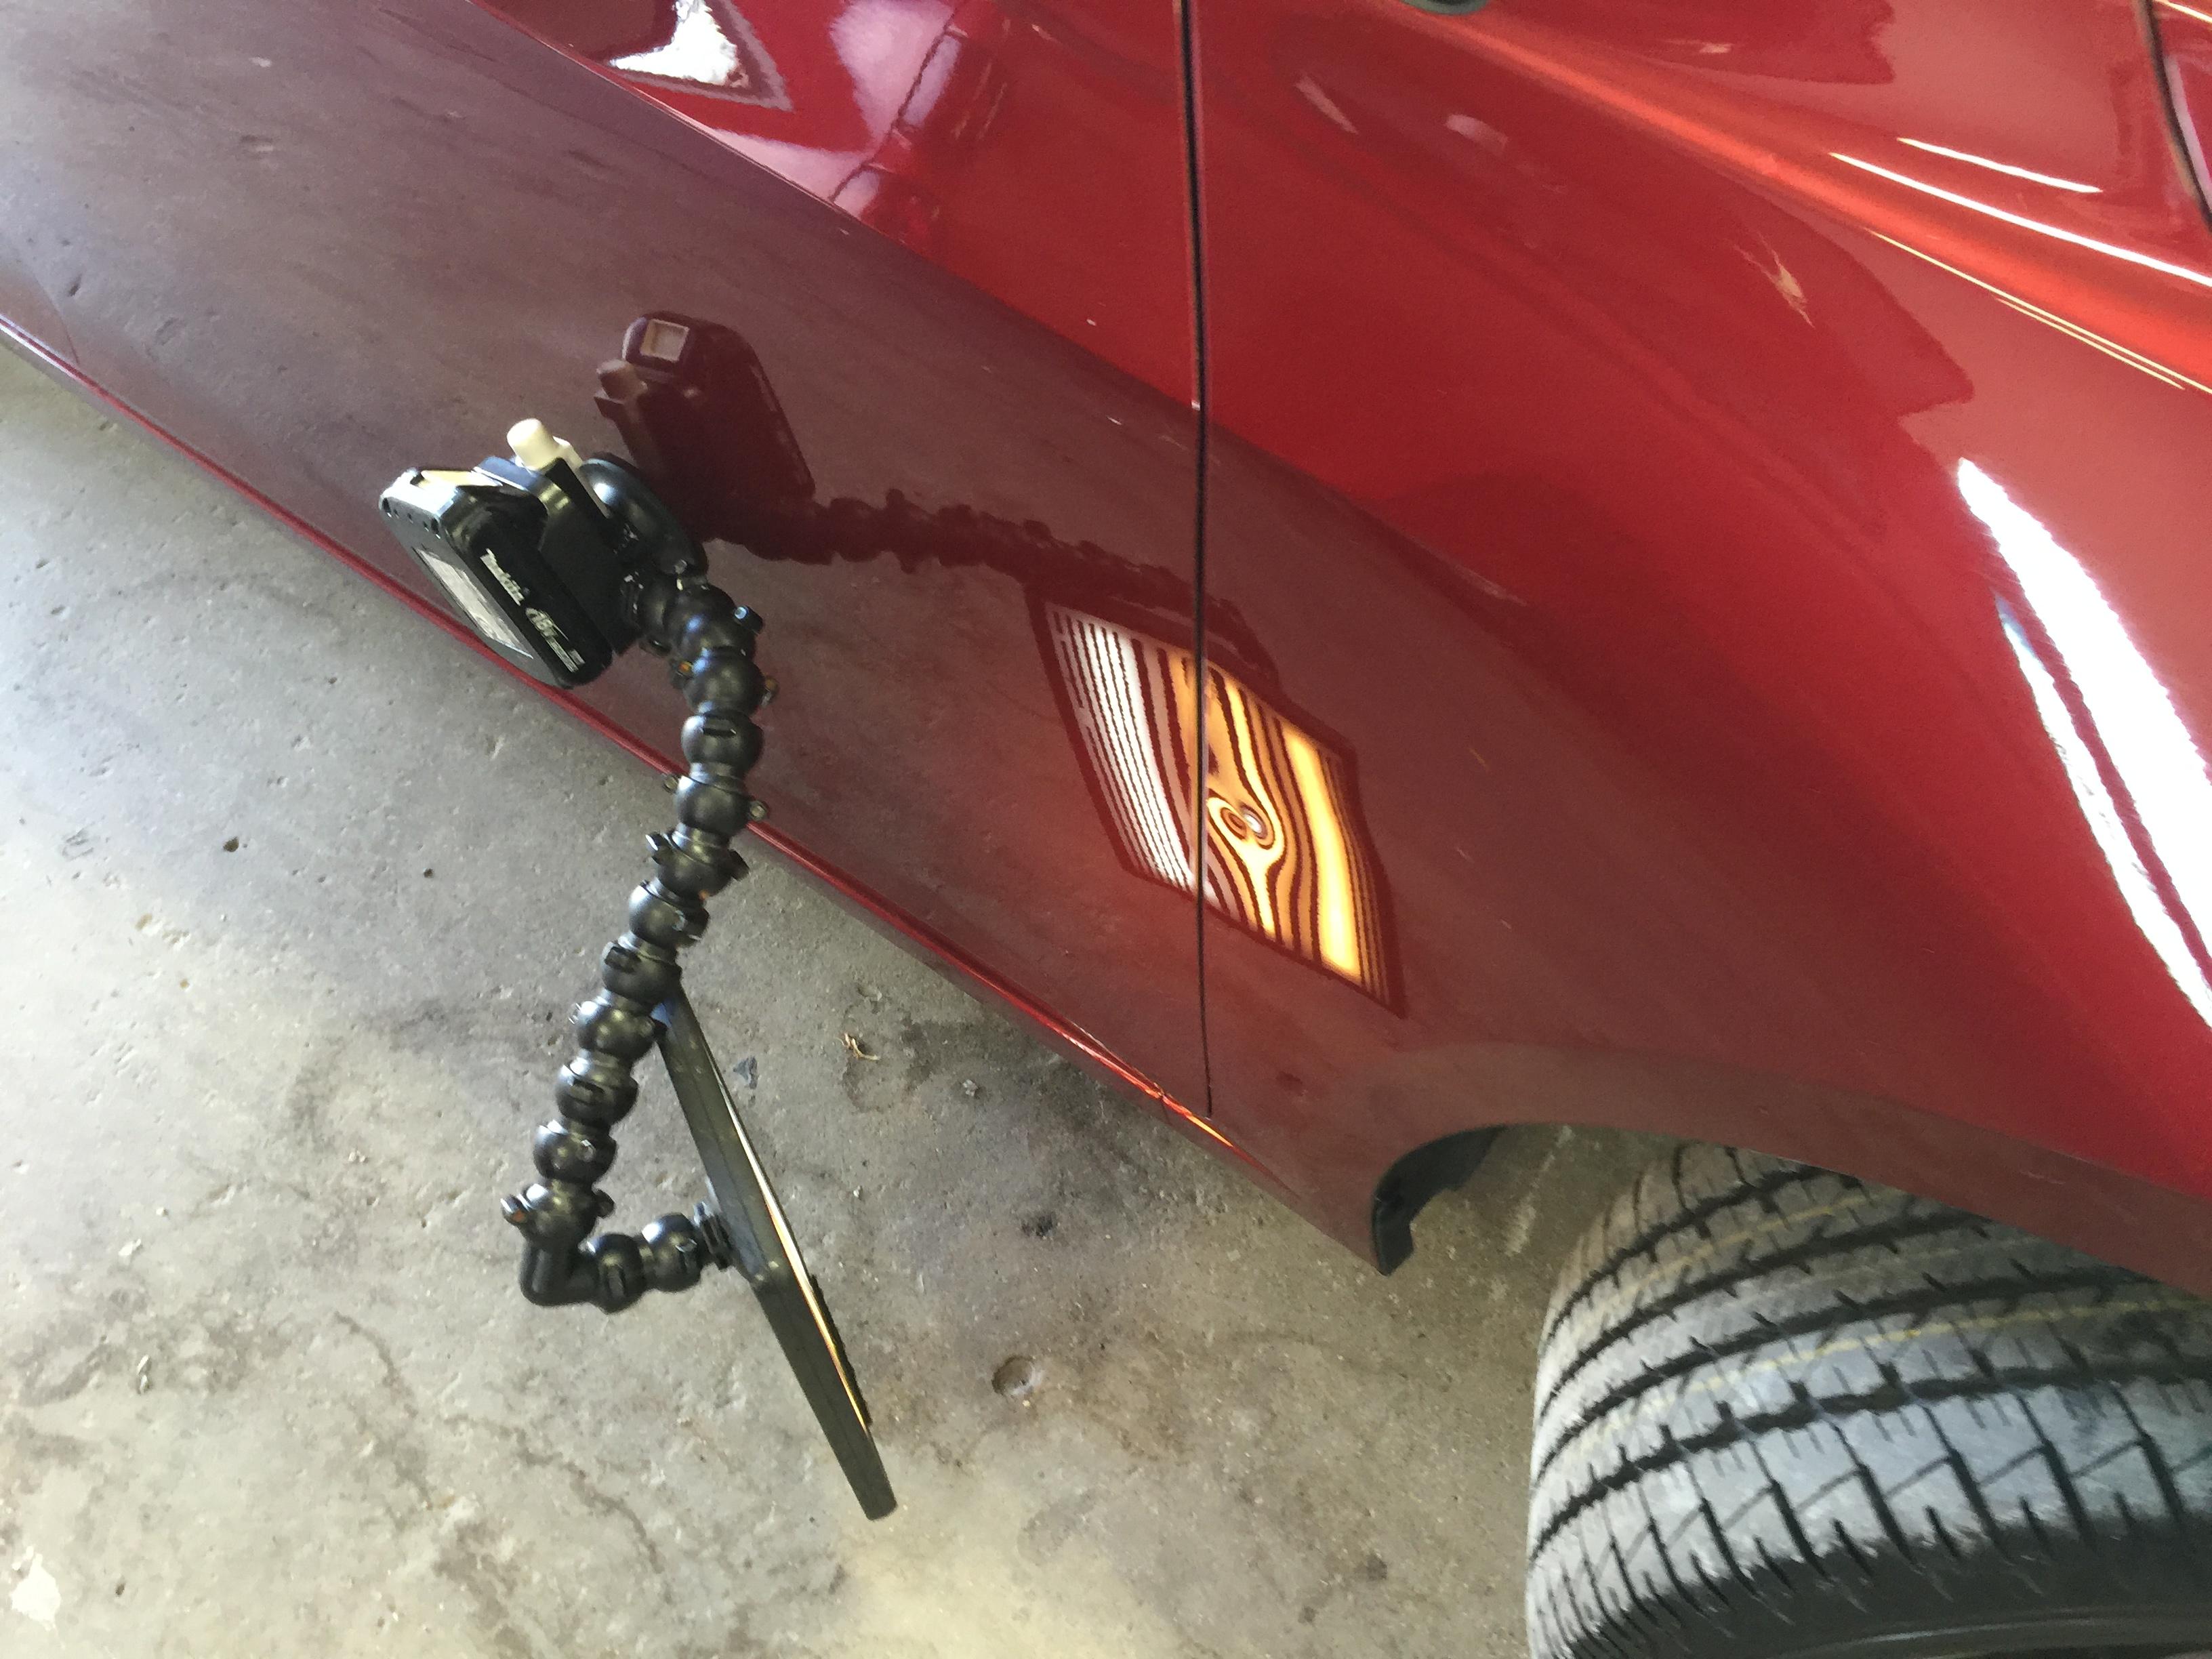 2015 Chevy Cruze, Paintless Dent Removal, Springfield's Mobile Dent Repair Specialist. Passenger Fender Sharp Dent. http://217dent.com